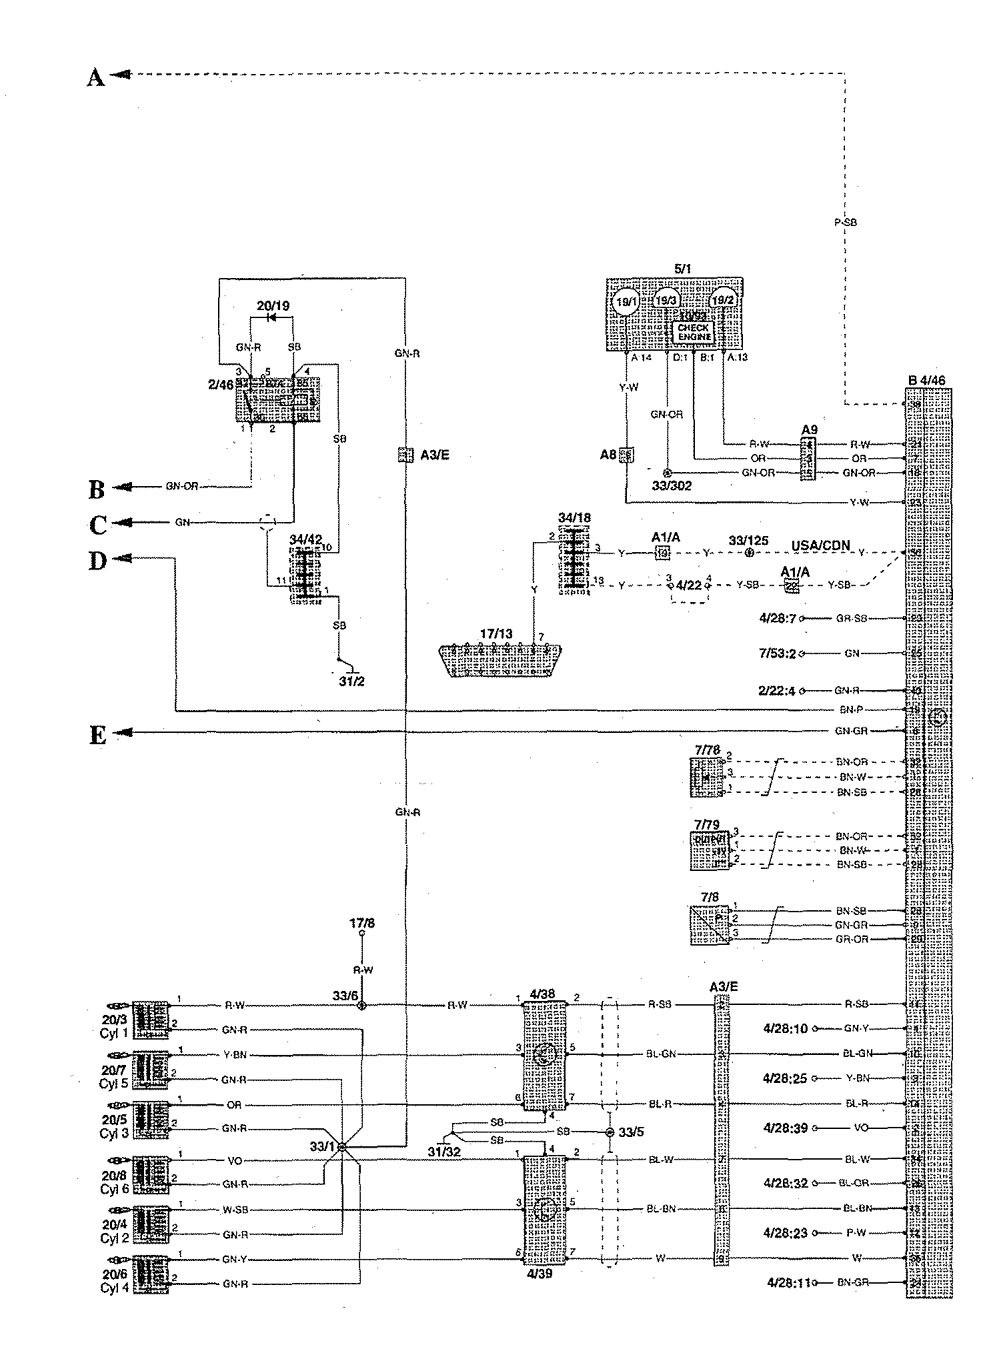 1998 volvo s90 engine diagram best wiring library 1997 Saab 9000 Engine Diagram 1998 volvo s90 engine diagram